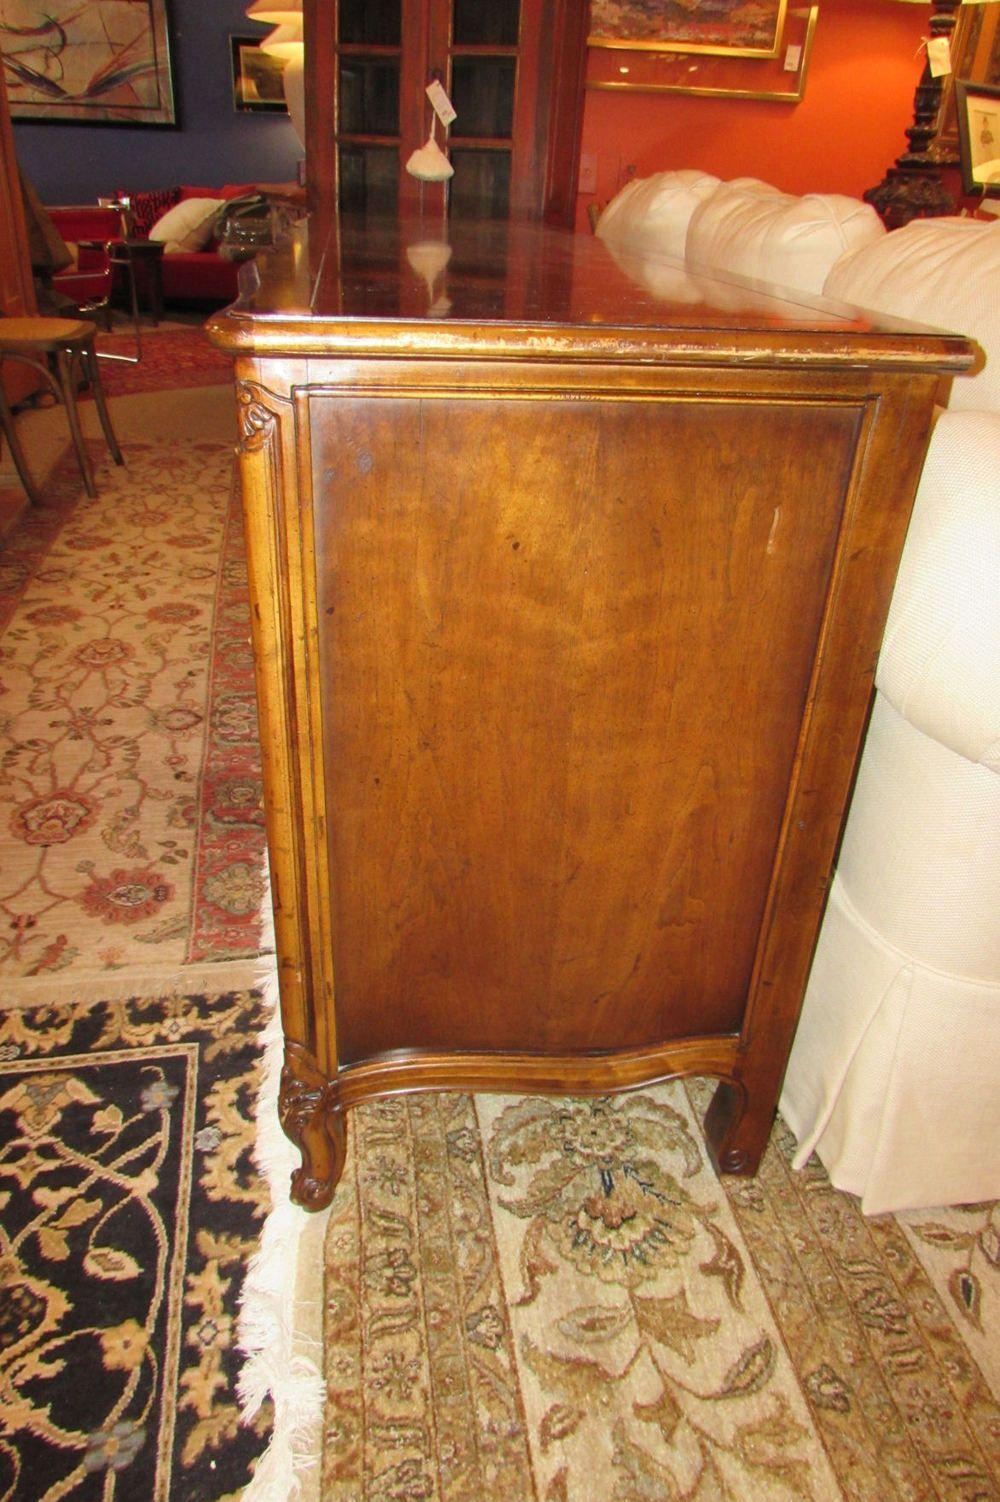 Vintage Henredon Bedroom Furniture Villandry French Louis Xv Style Dresser